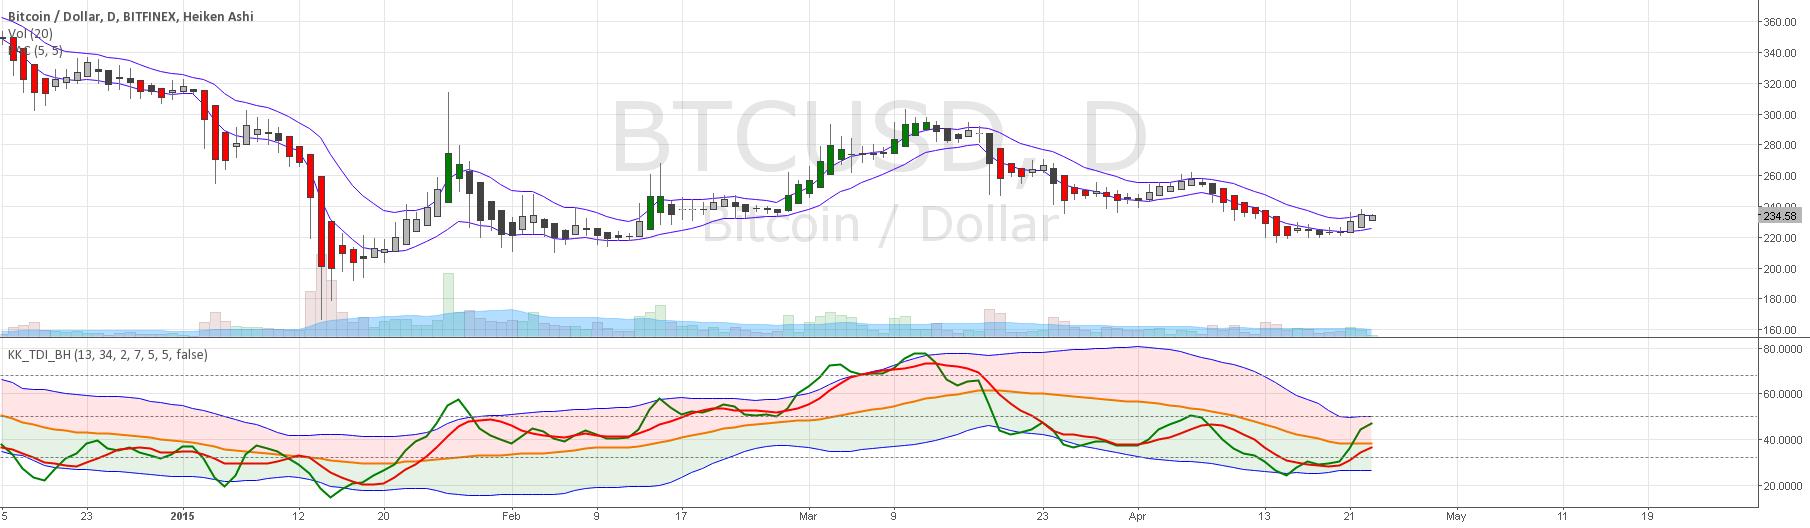 KK_Traders Dynamic Index_Bar Highlighting